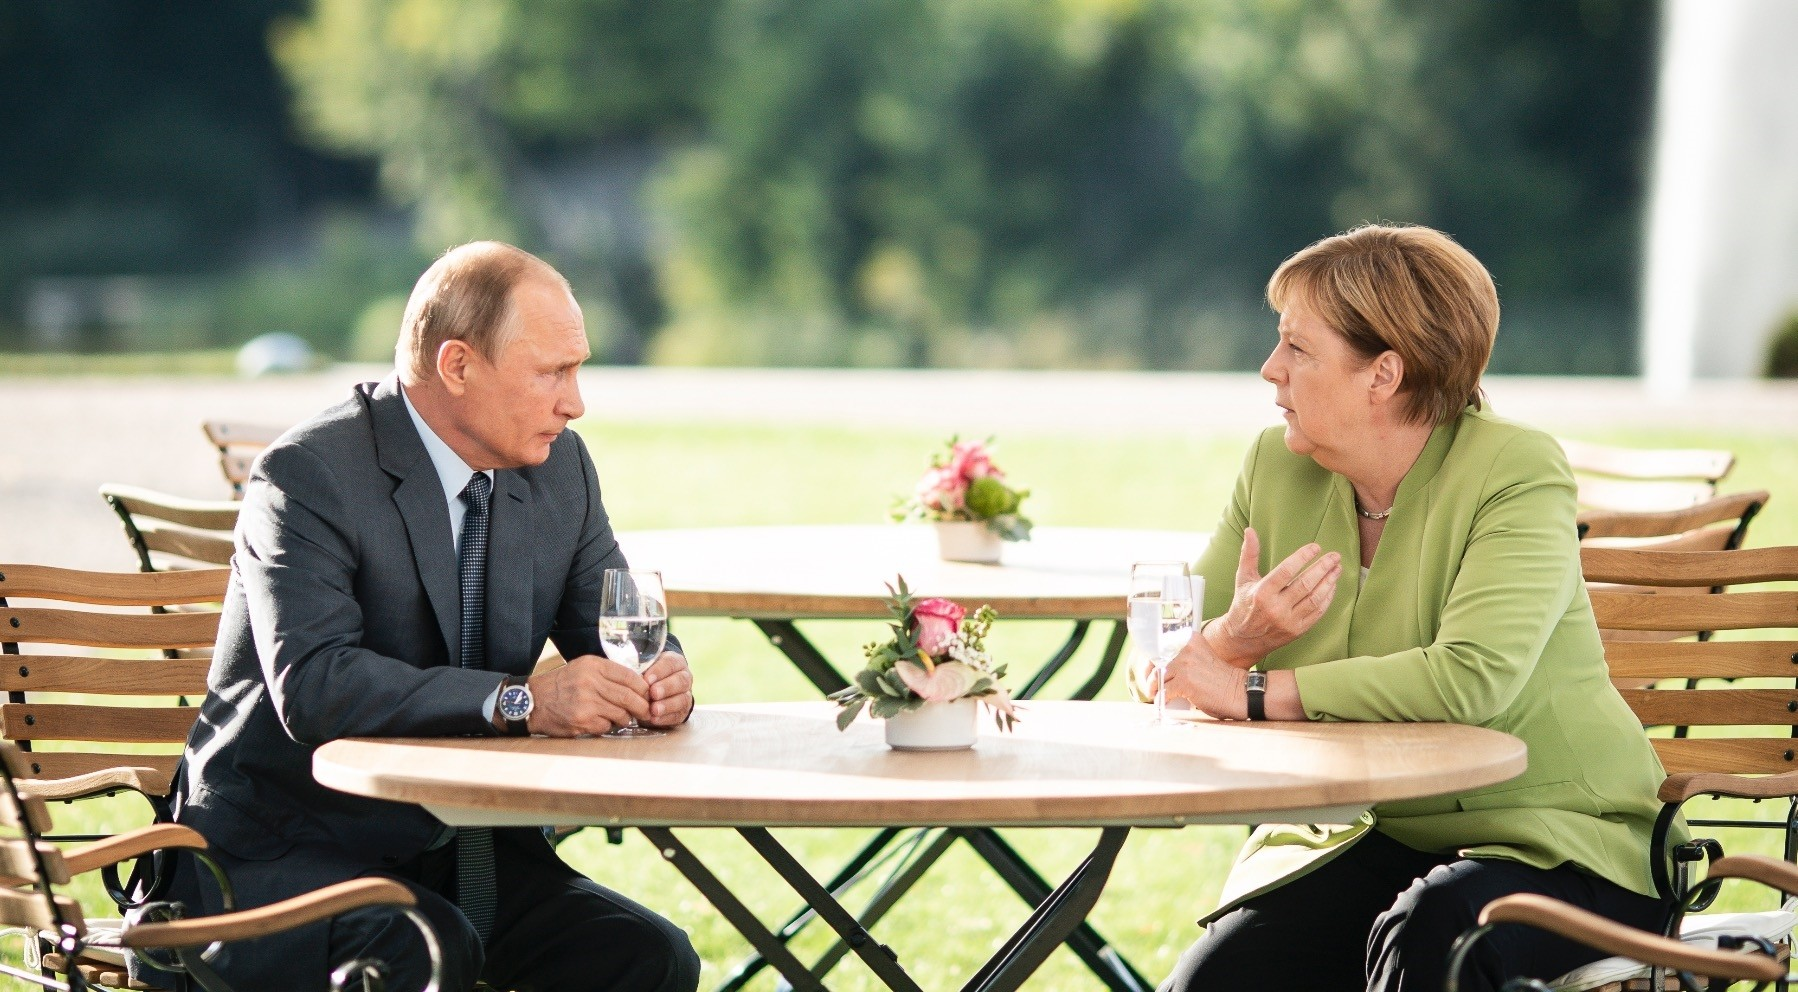 Russian President Vladimir Putin (L) and German Chancellor Angela Merkel (R) hold talks at the German governmentu2019s guest house Meseberg Palace, Gransee, Aug. 18.